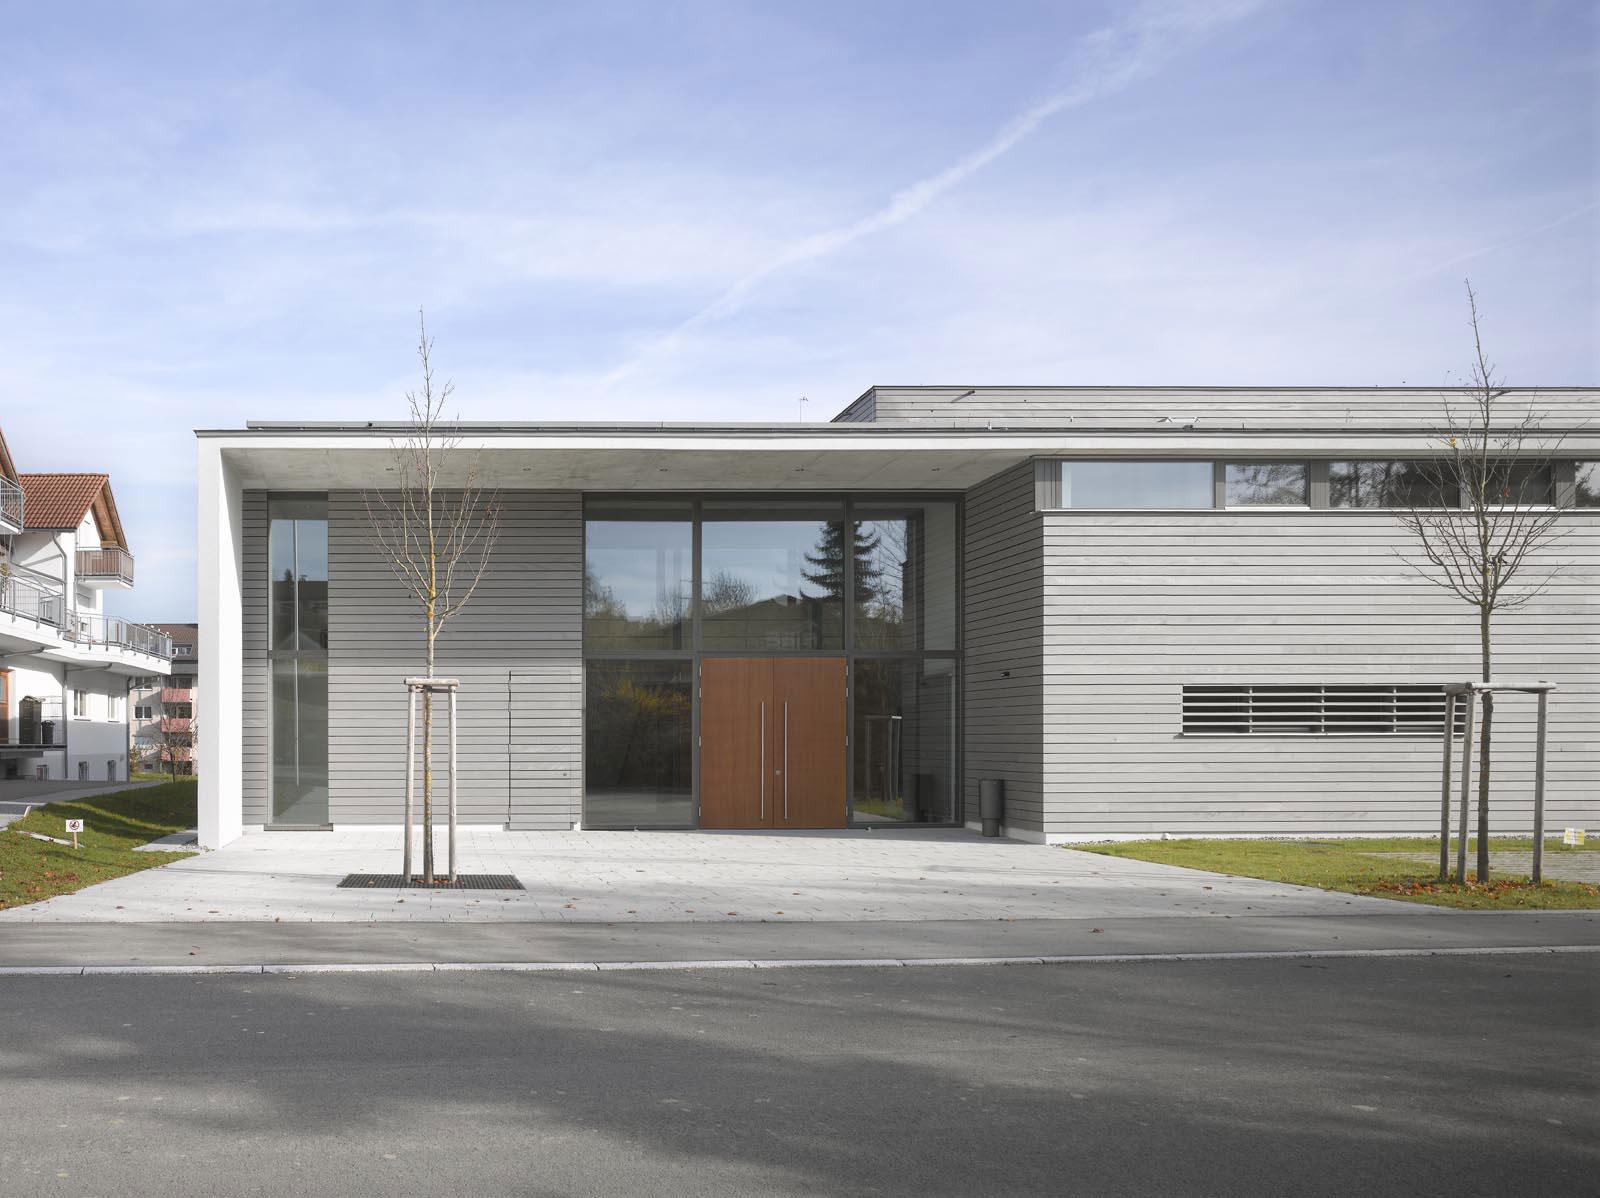 21-08-23-Slider-Neukirch-02